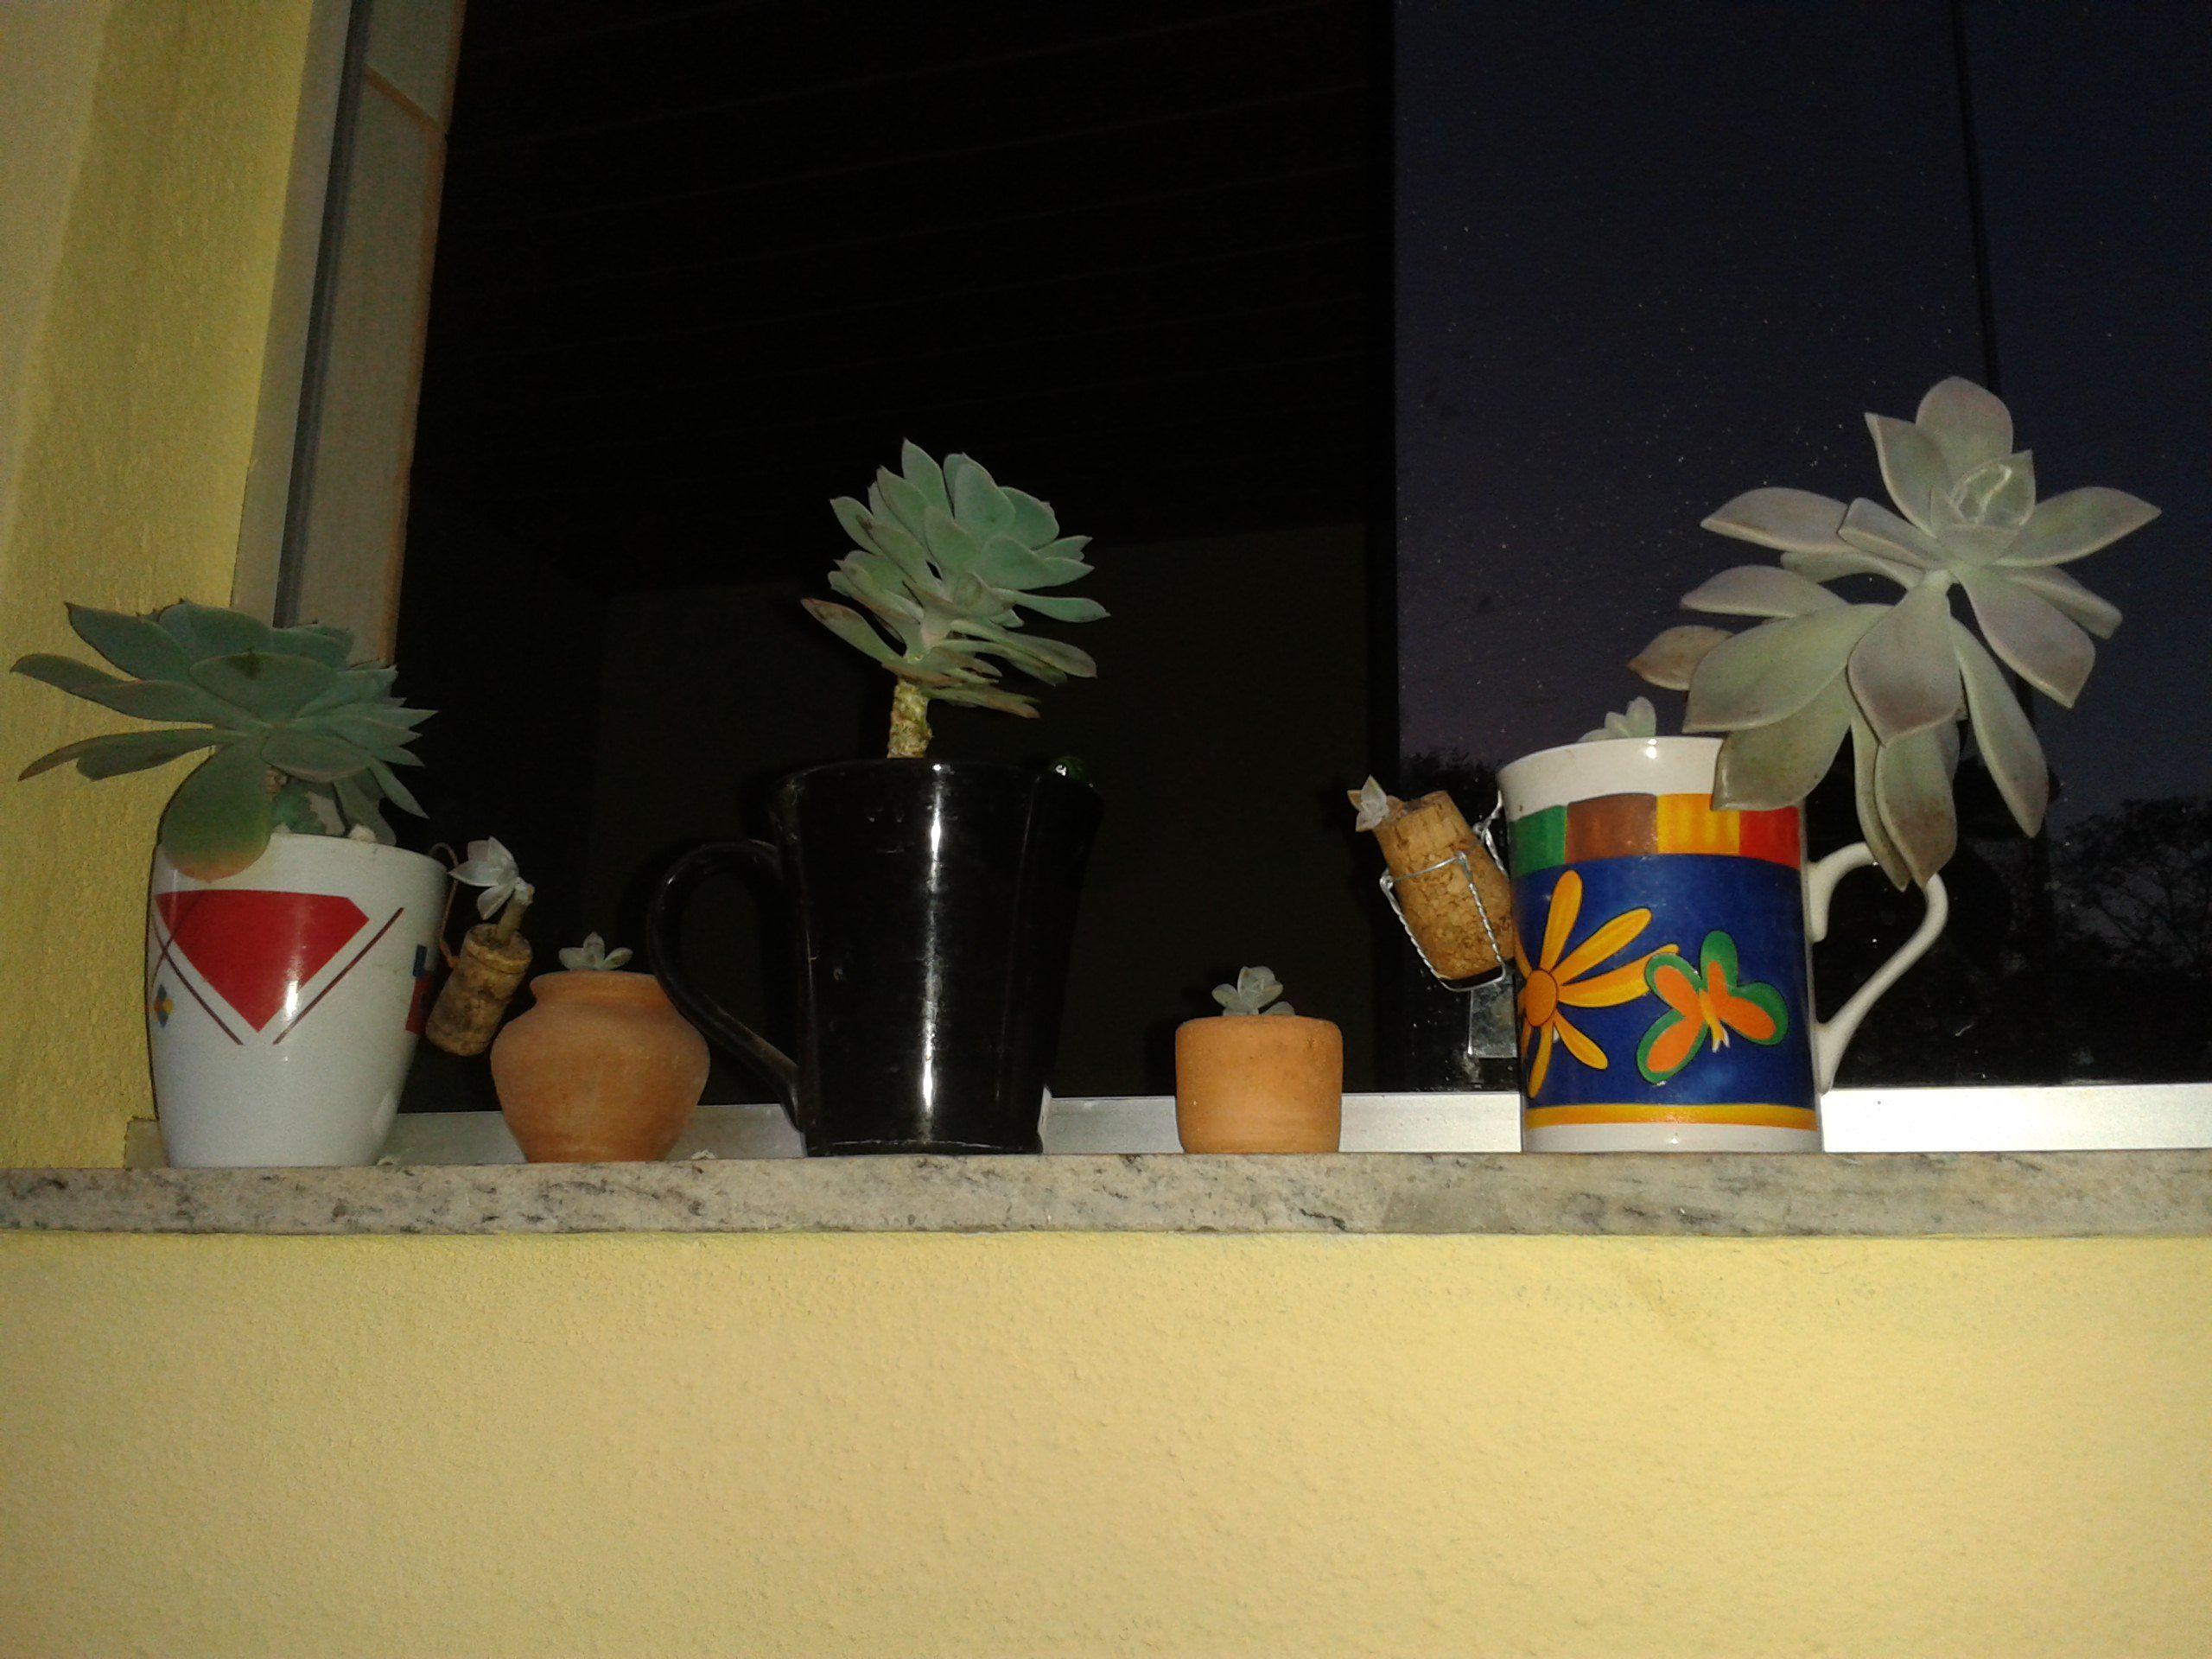 Xícaras nas janelas